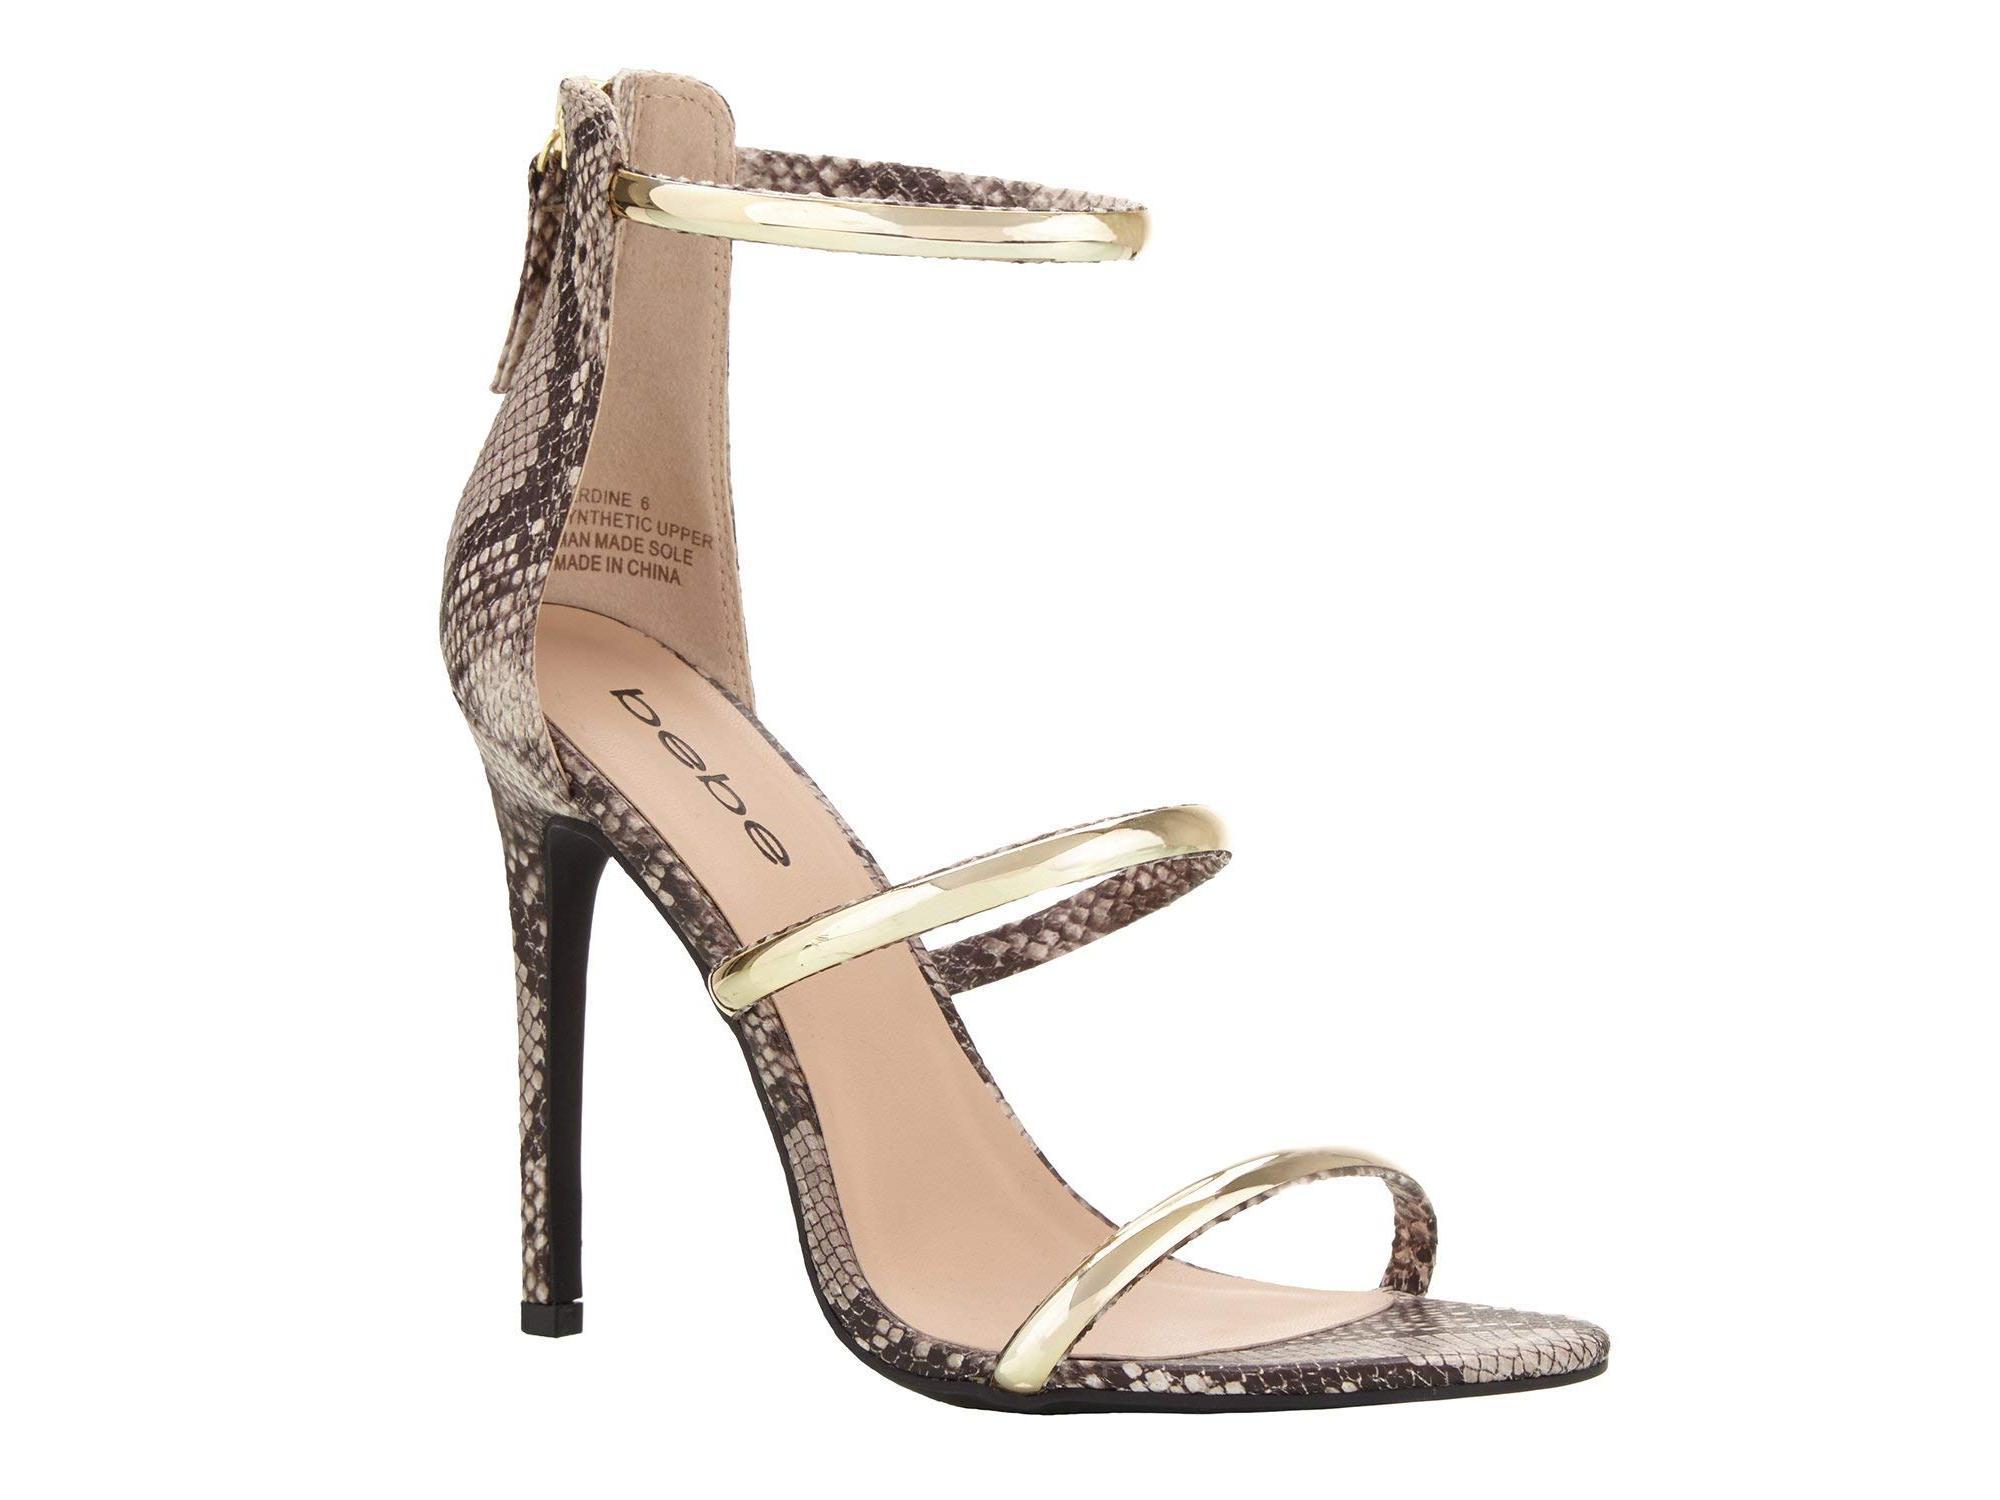 2644a37b5 Bebe Womens Berdine Open Toe Casual Strappy Sandals